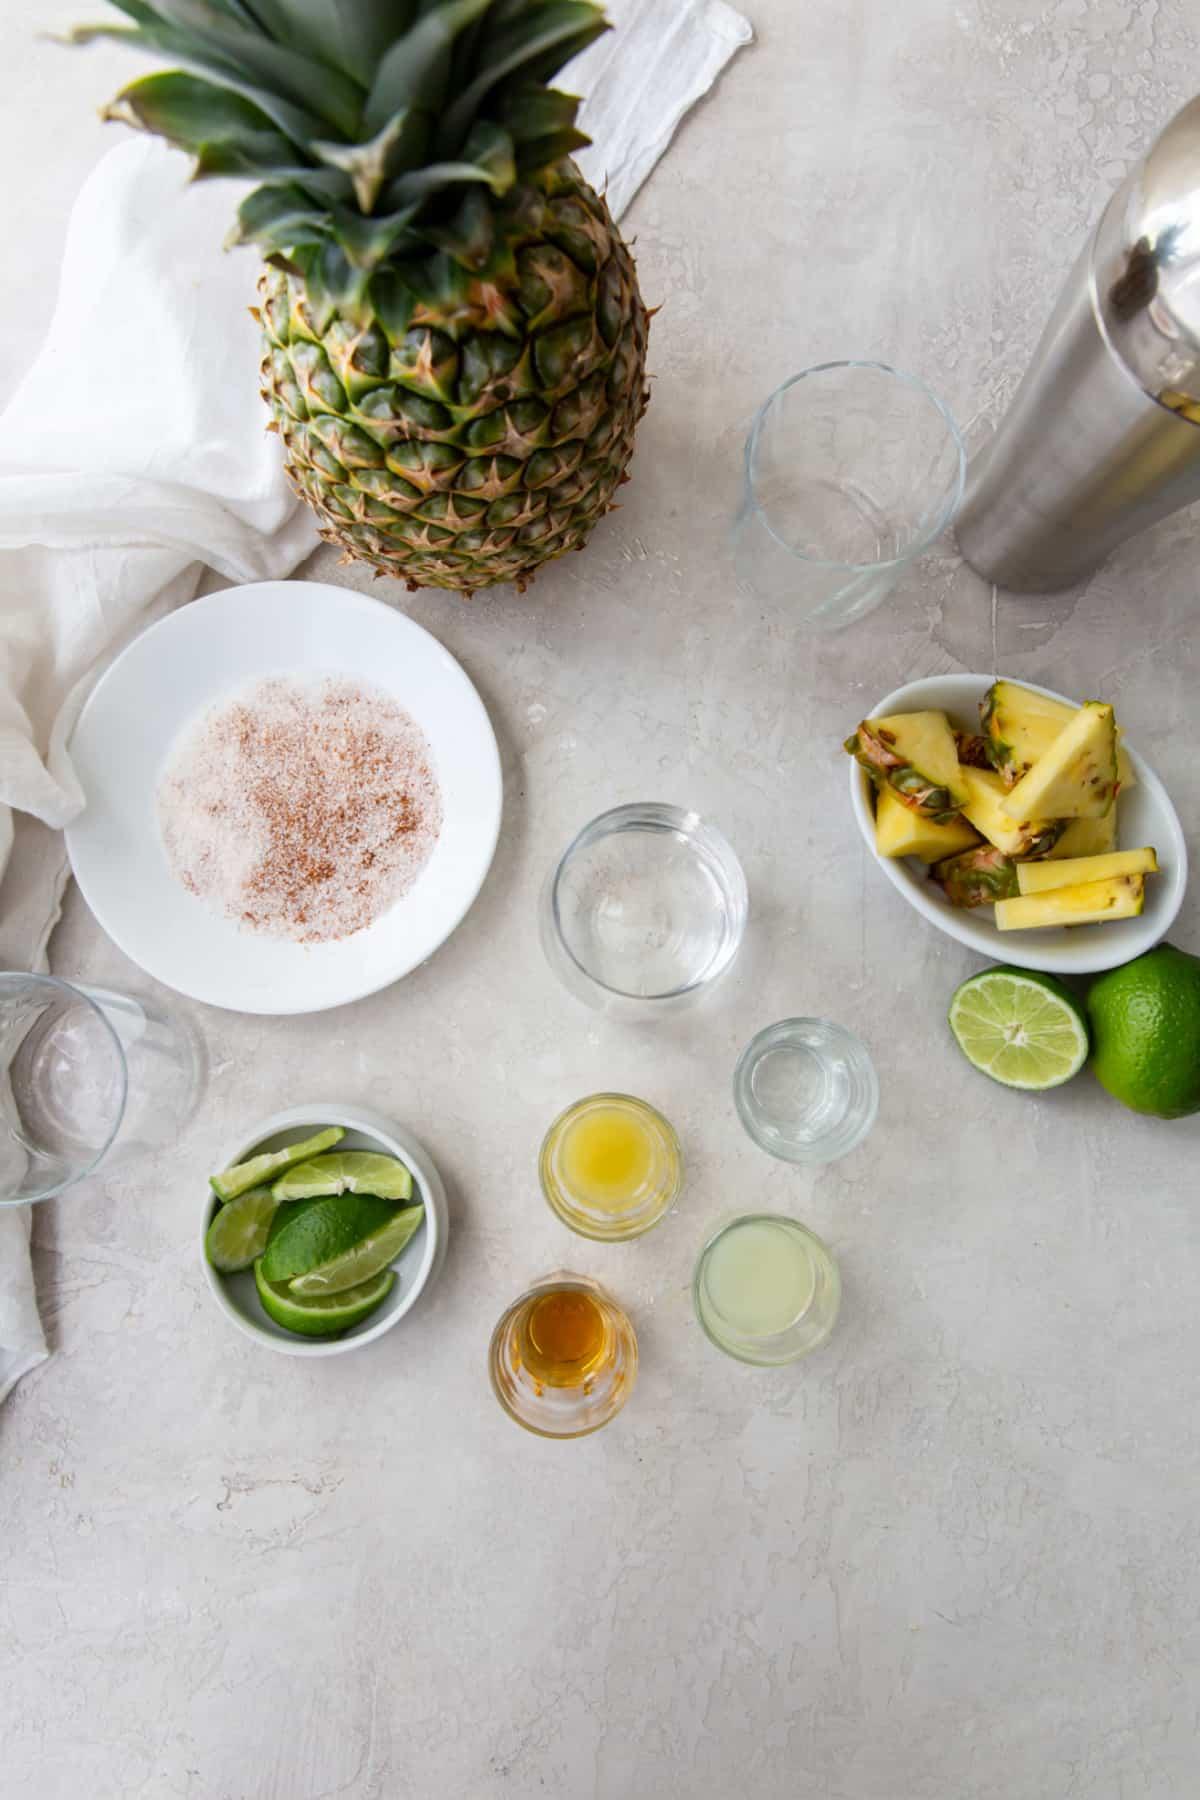 mezcalita ingredients on a table